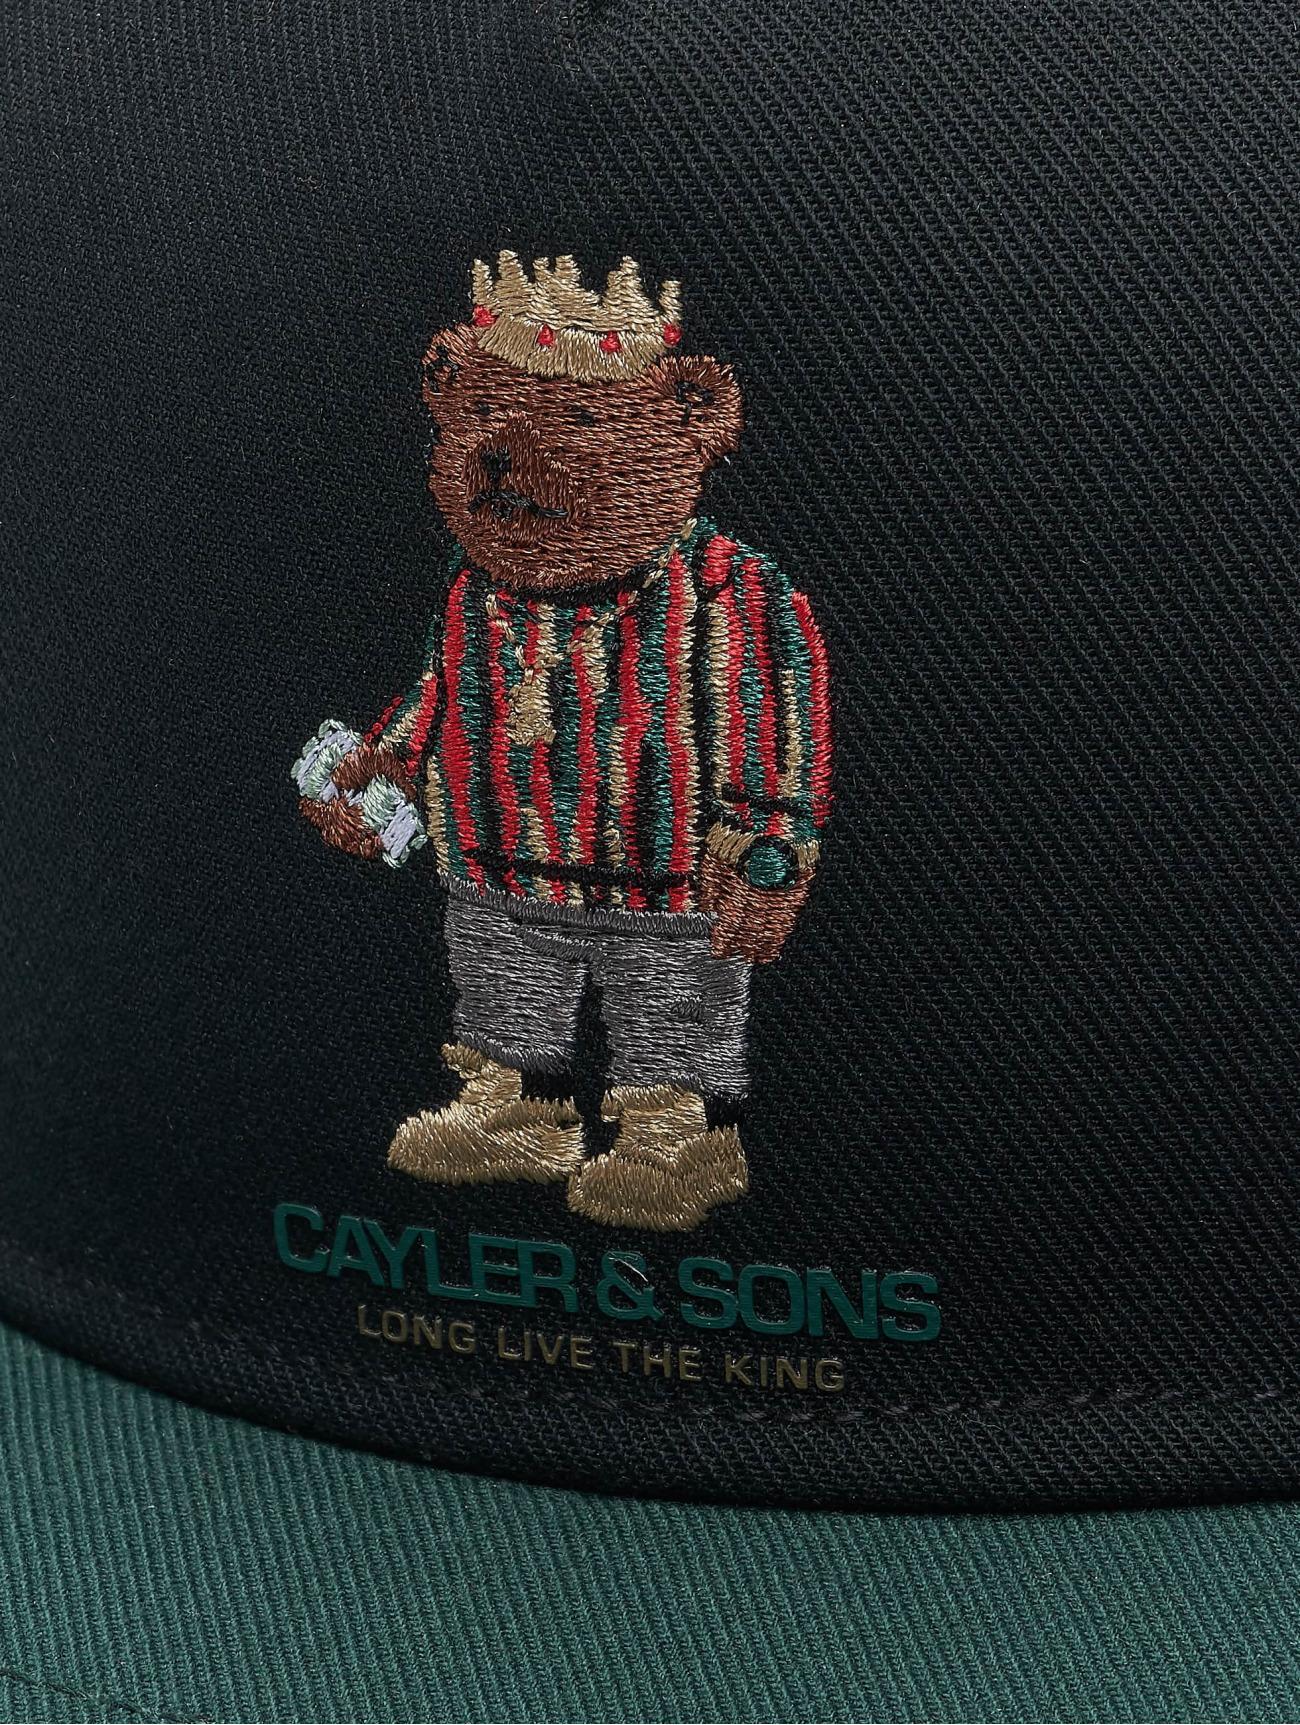 Cayler & Sons  WL Bedstuy  noir  Casquette Snapback & Strapback  427425 Homme Casquettes